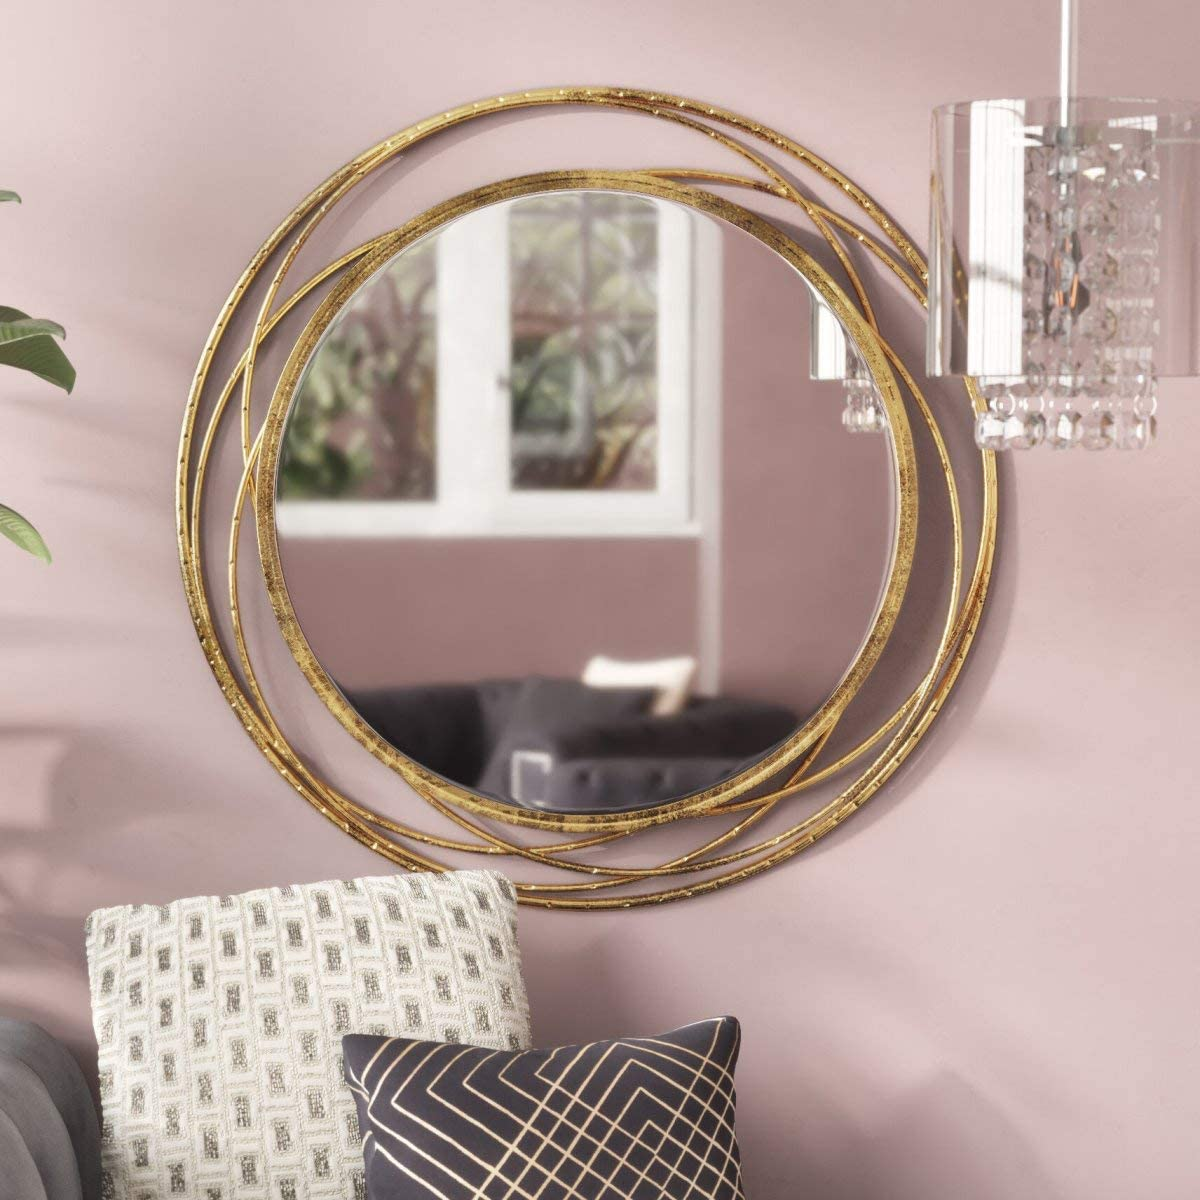 SPAZIO Swirl Wall Mirror, One Size, Antique Gold